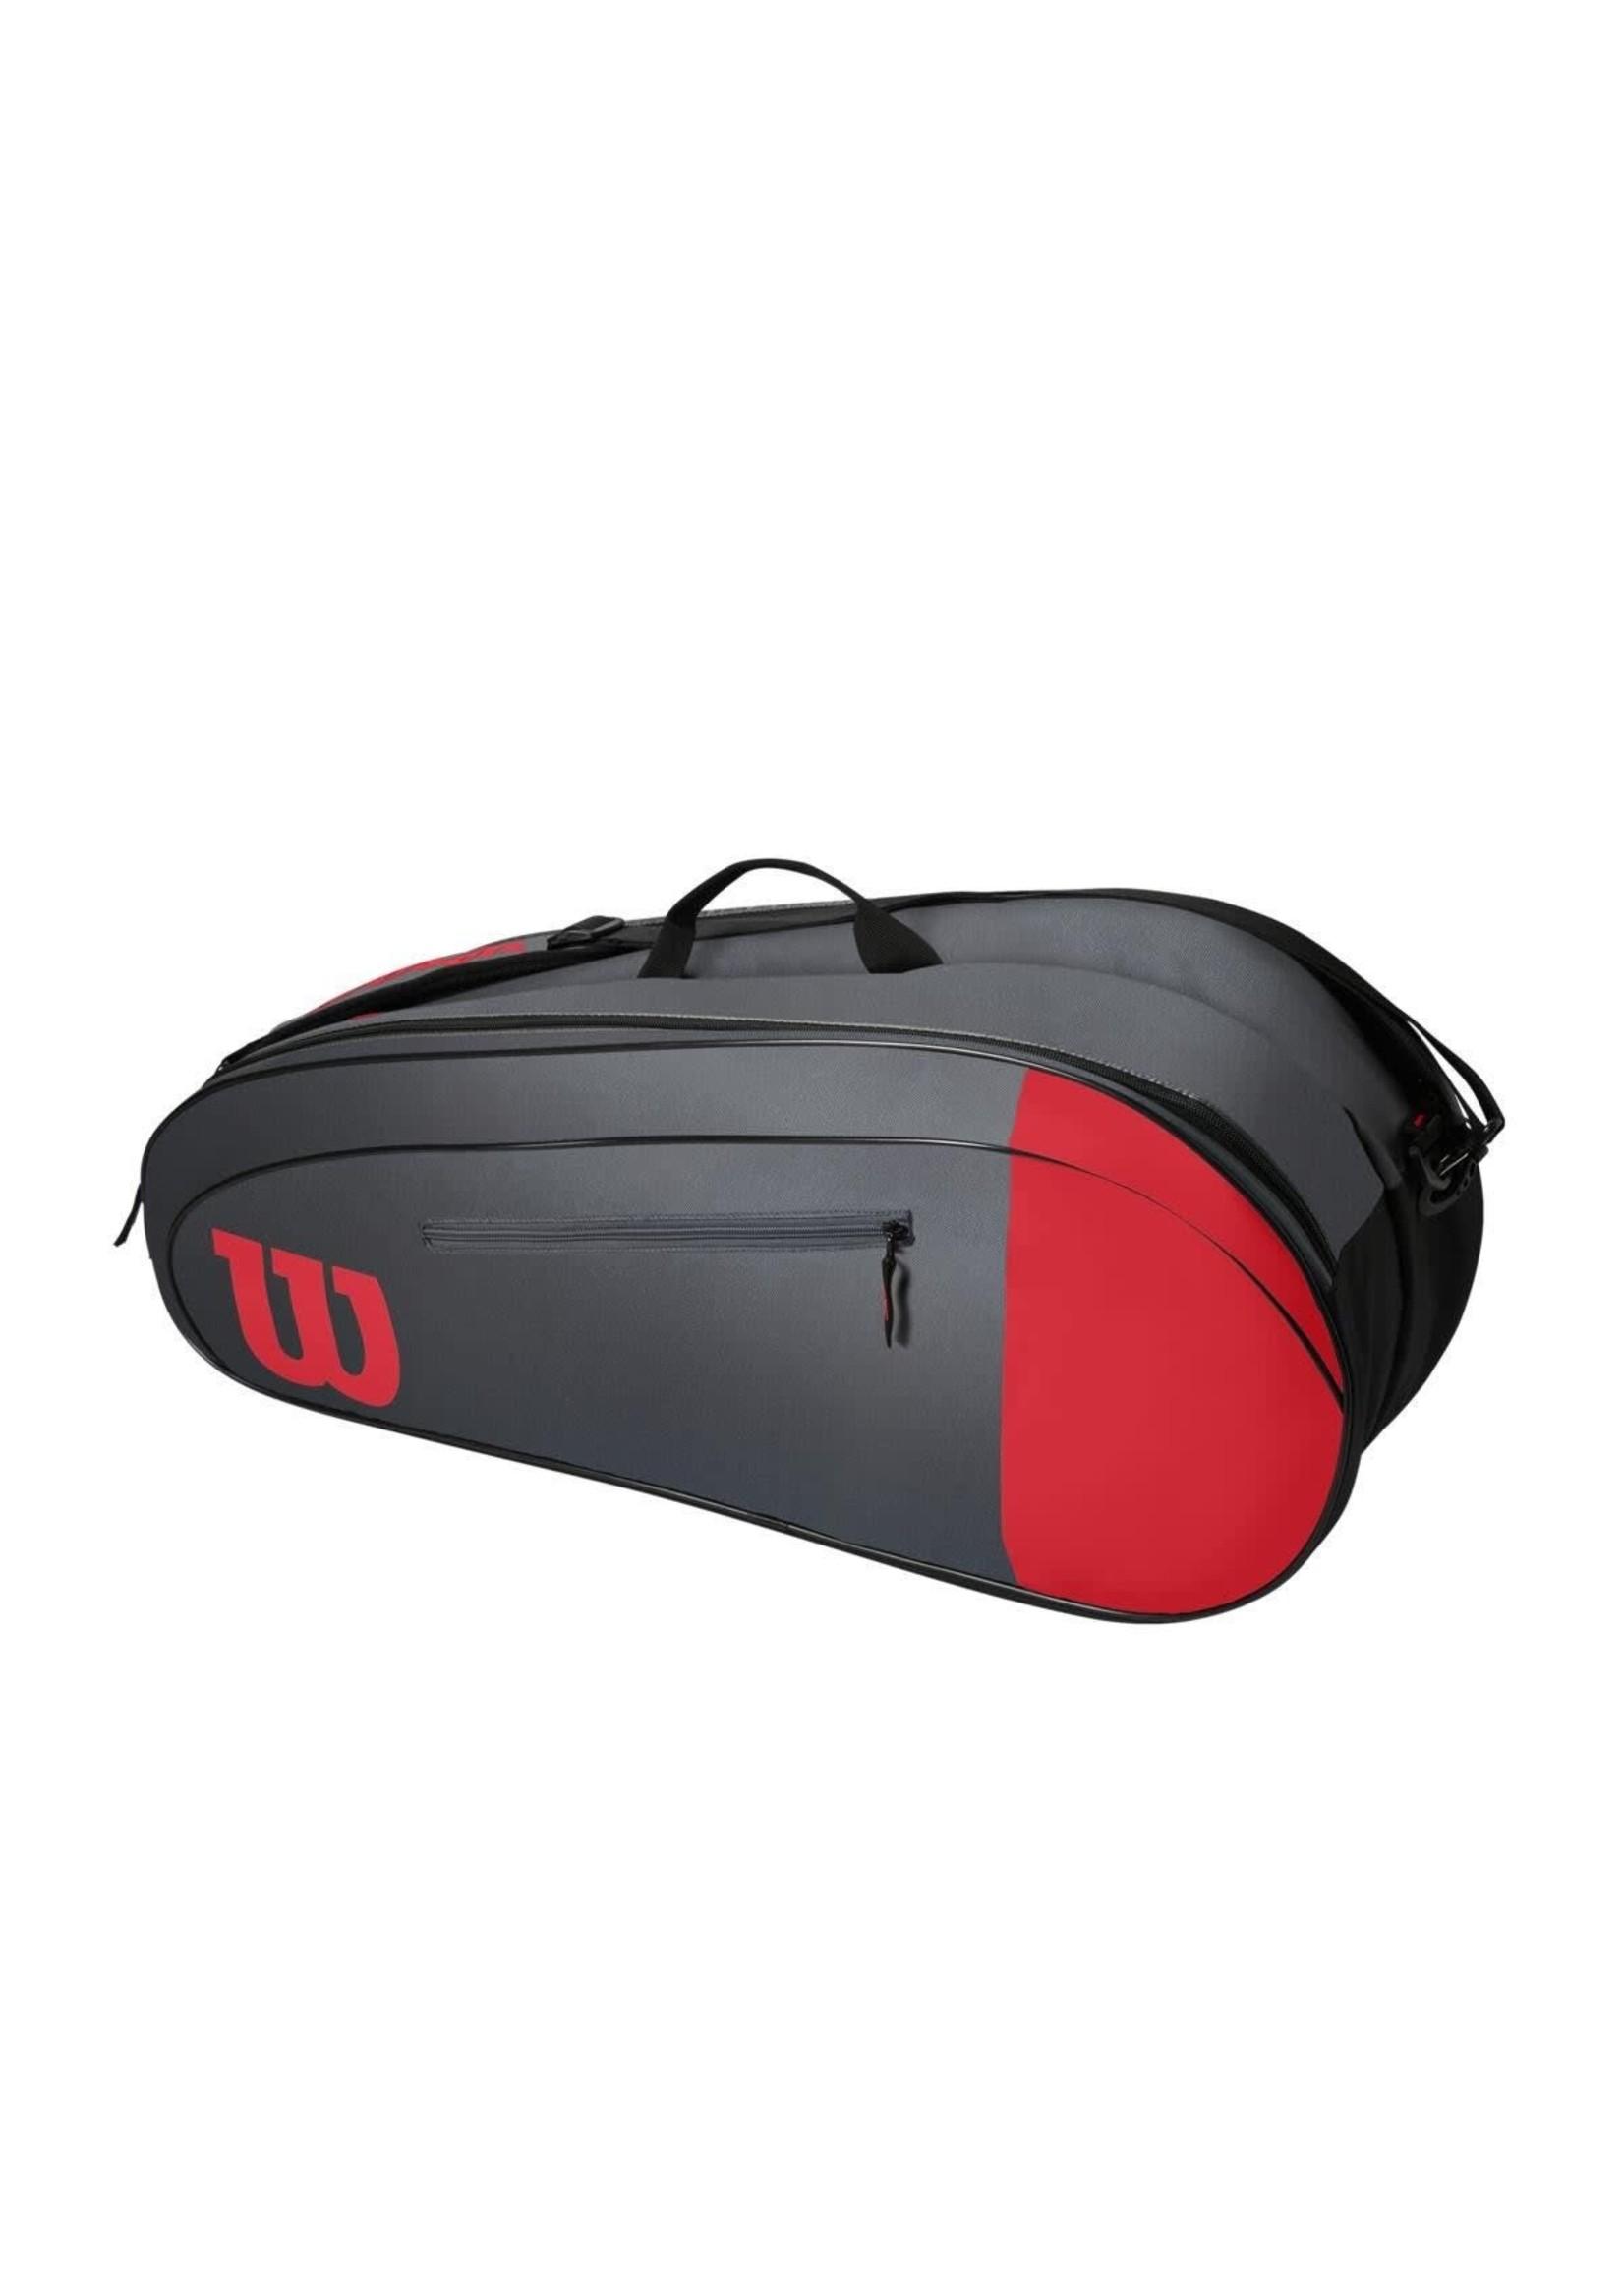 Wilson Wilson Team 6 Racket Bag (2021)